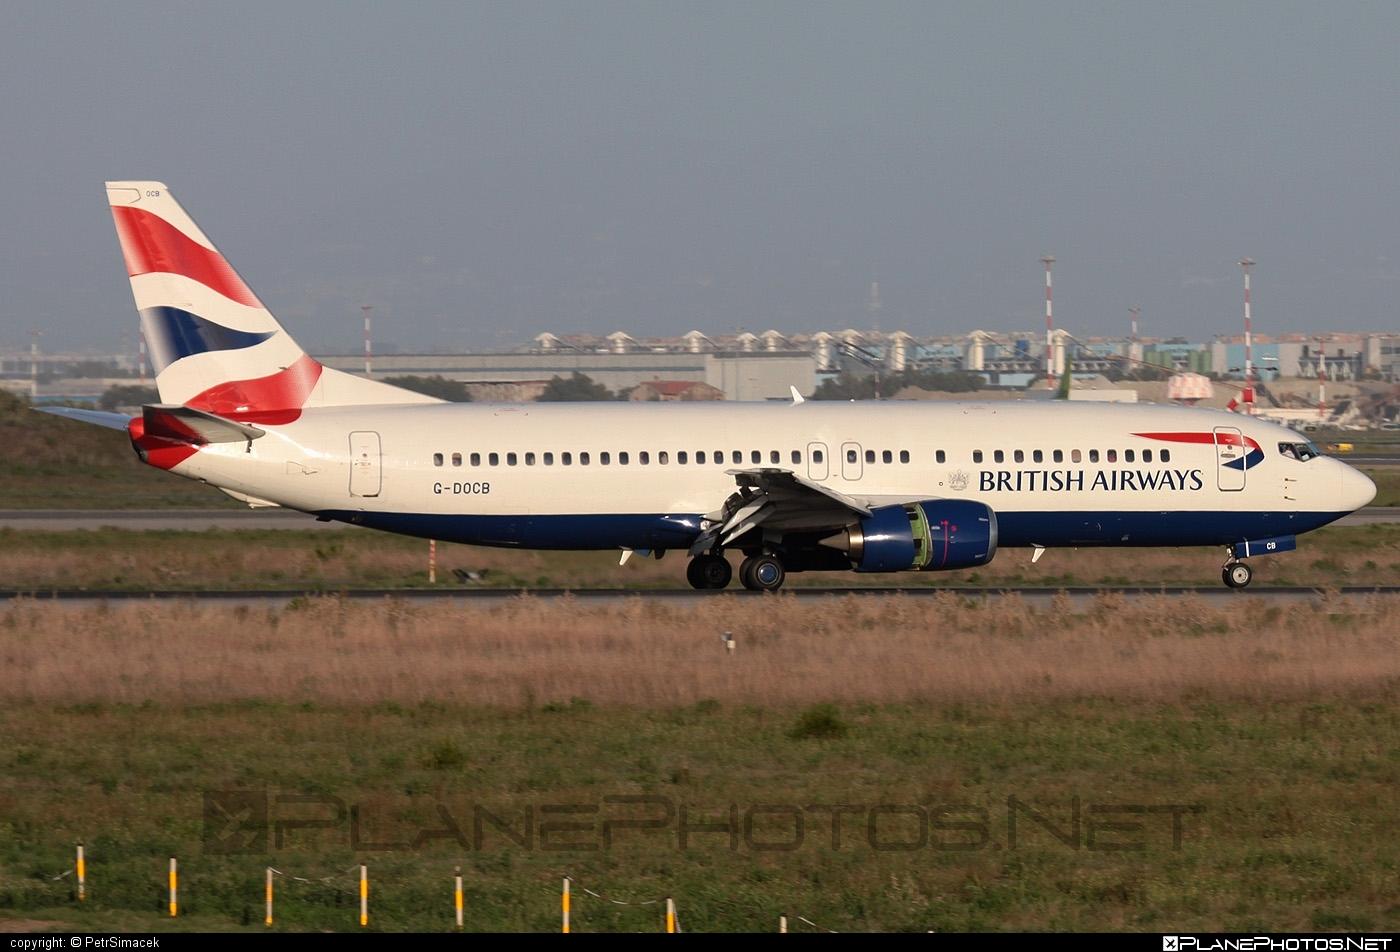 Boeing 737-400 - G-DOCB operated by British Airways #b737 #boeing #boeing737 #britishairways